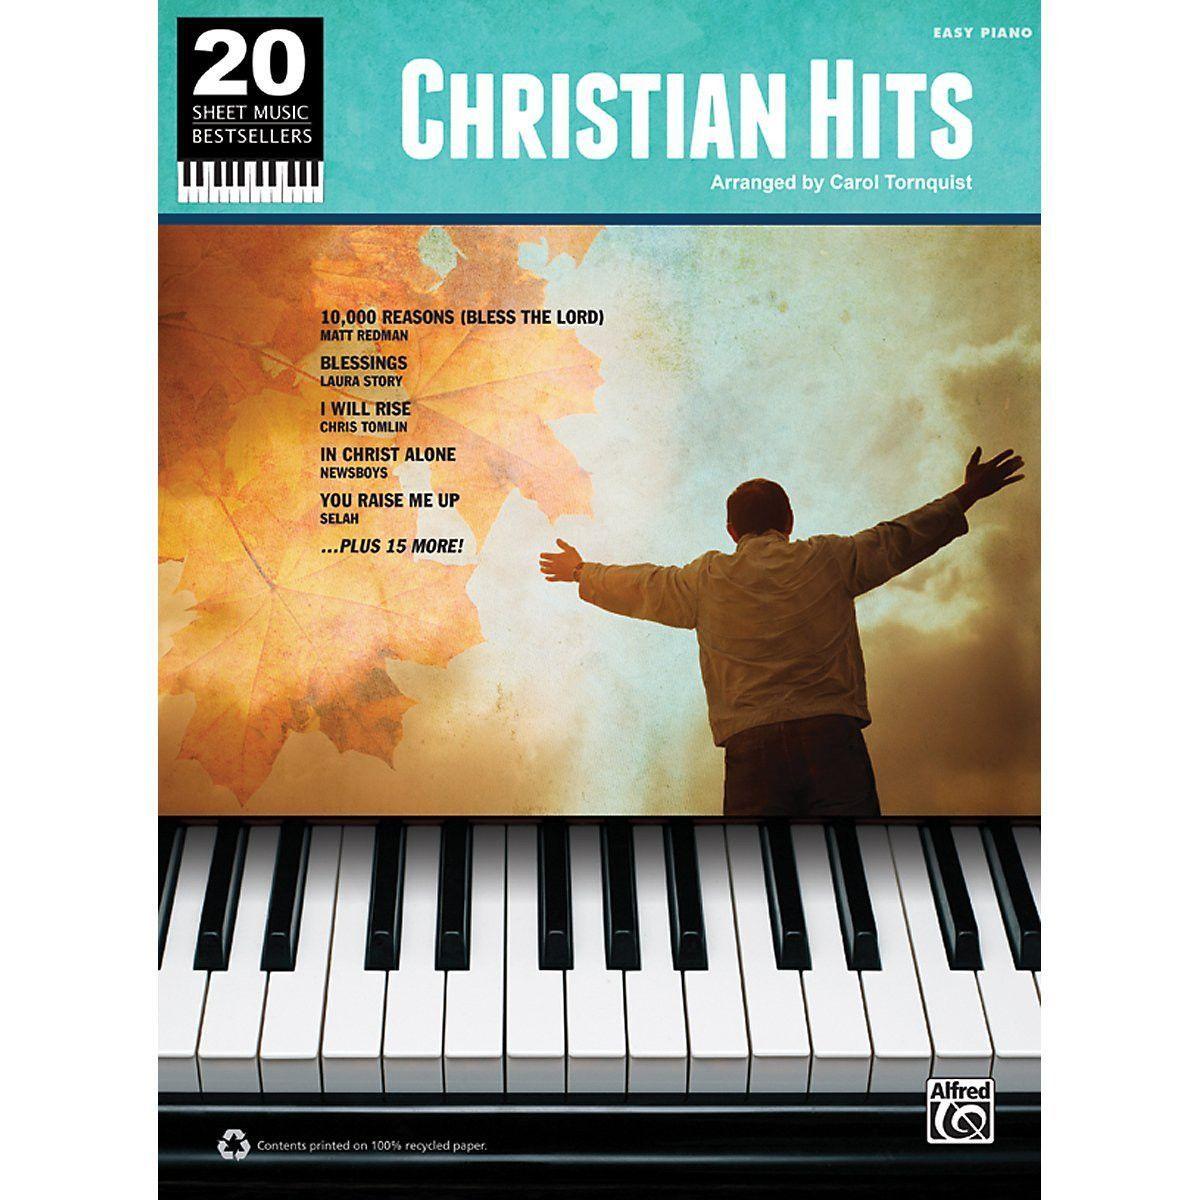 Christian hits easy piano book 20 sheet music bestsellers alfred christian hits easy piano book 20 sheet music bestsellers alfred hexwebz Gallery